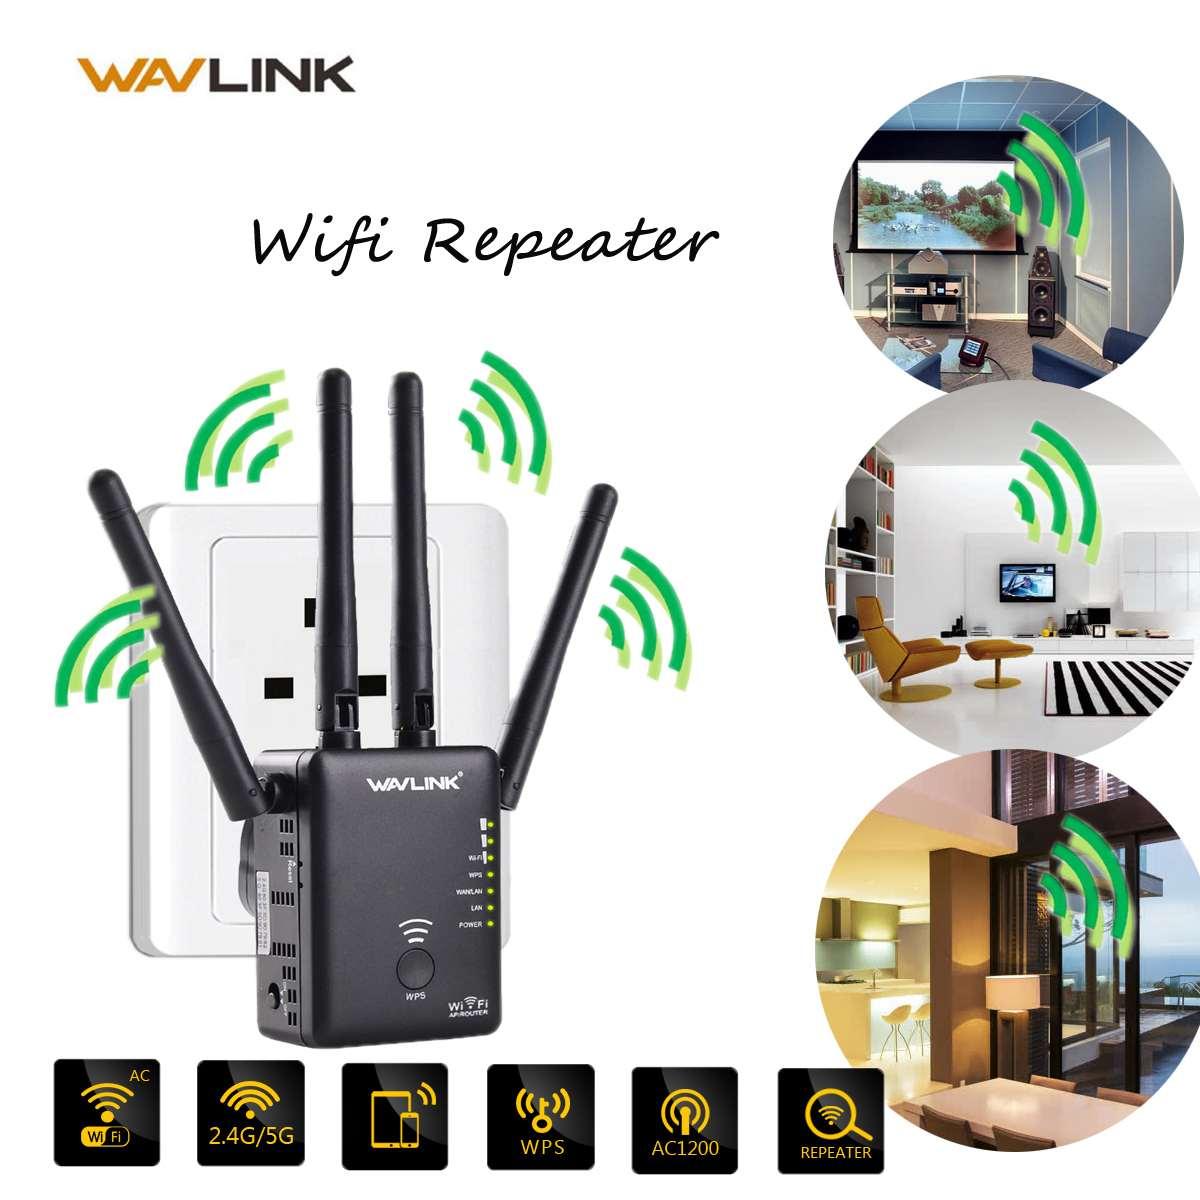 1200 Mbps 2,4G y 5G inalámbrica WiFi repetidor para AP/Router 802,11 2X LAN extensor de red los Routers